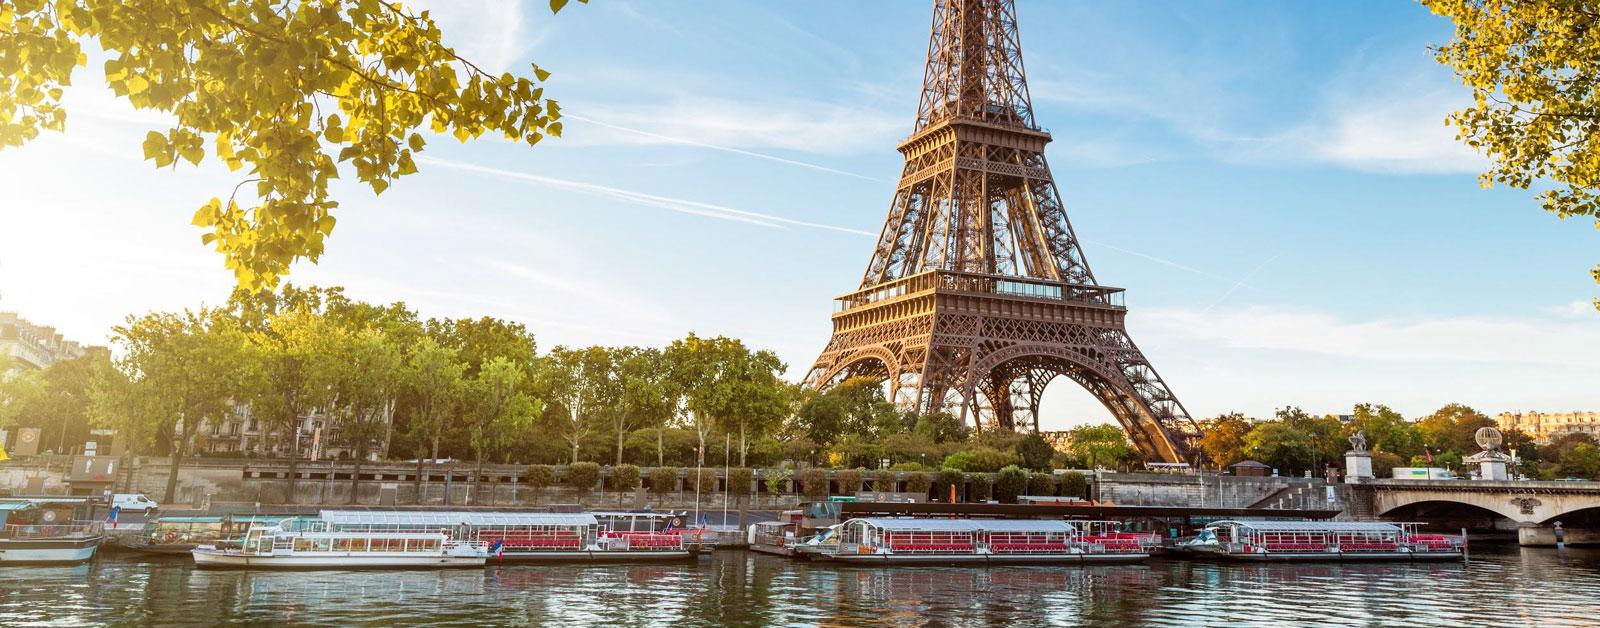 France: Architecture